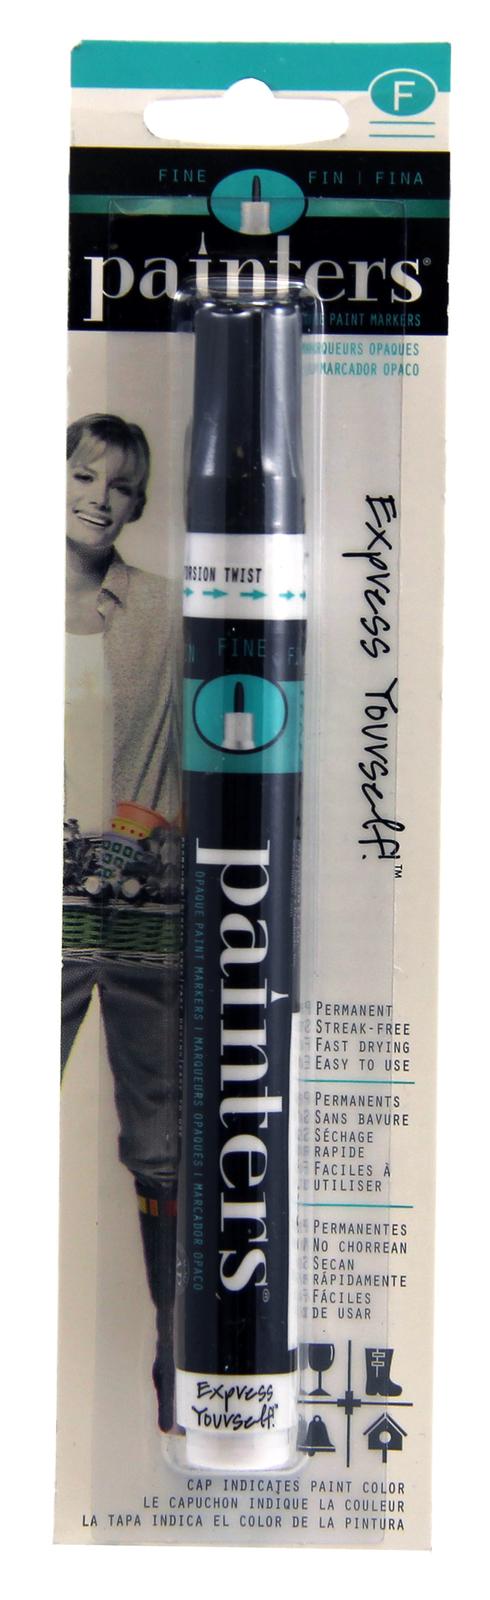 Painters Acrylic Paint Markers - Black Fine image